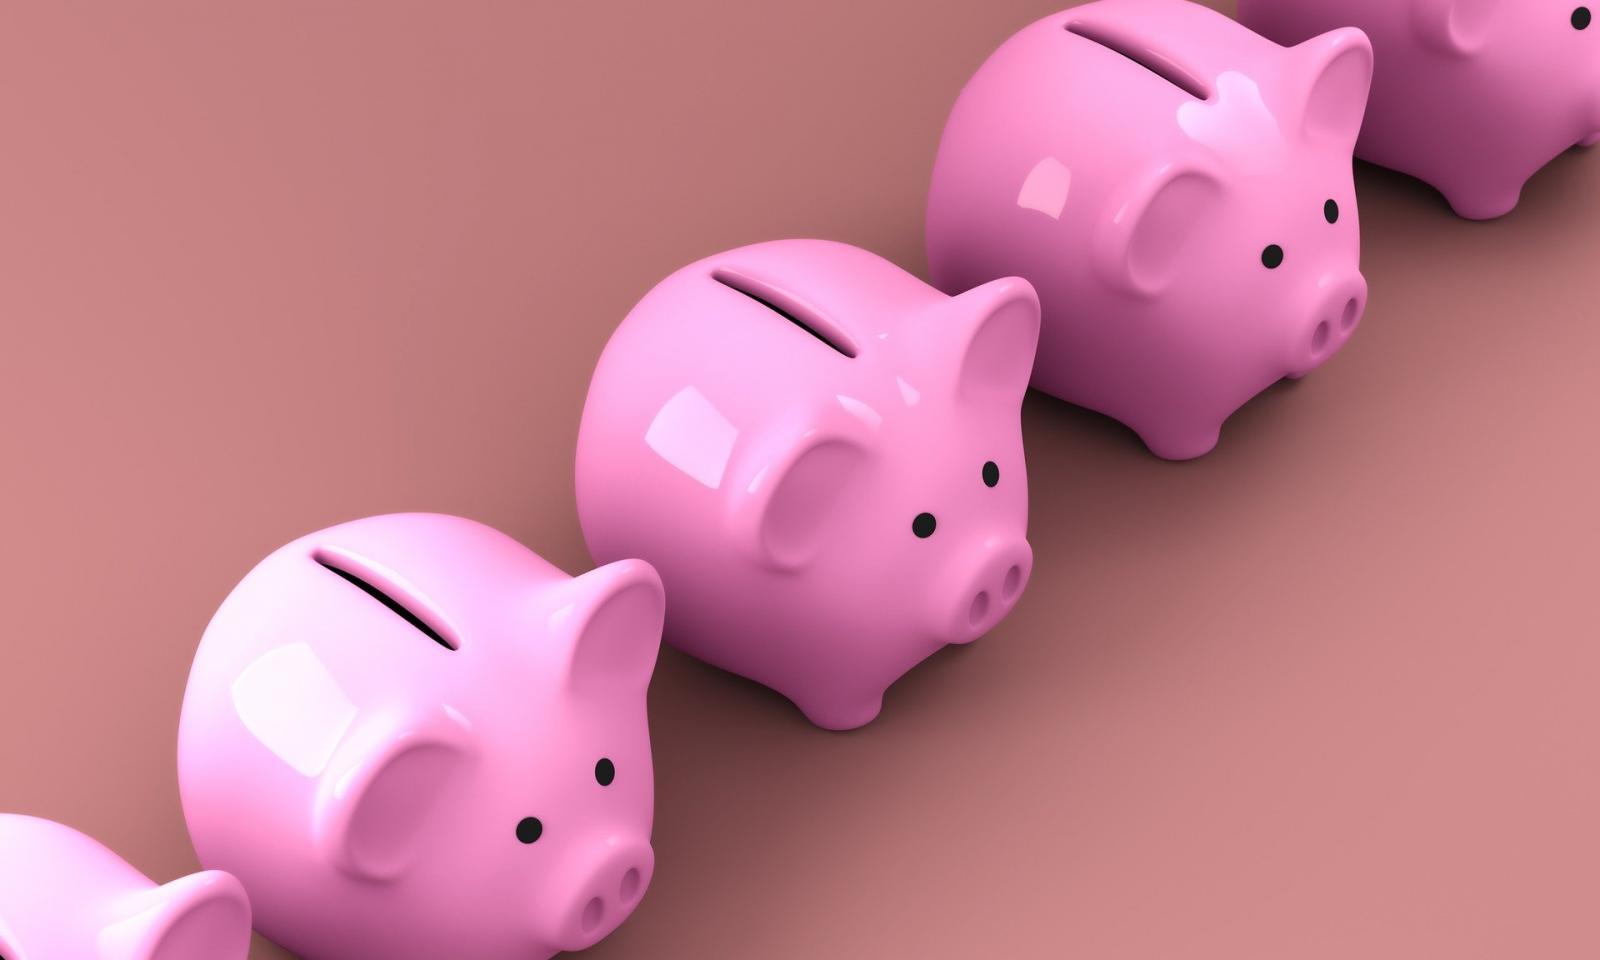 Piggy bank for retirement. Credit: Pixabay, QuinceCreative